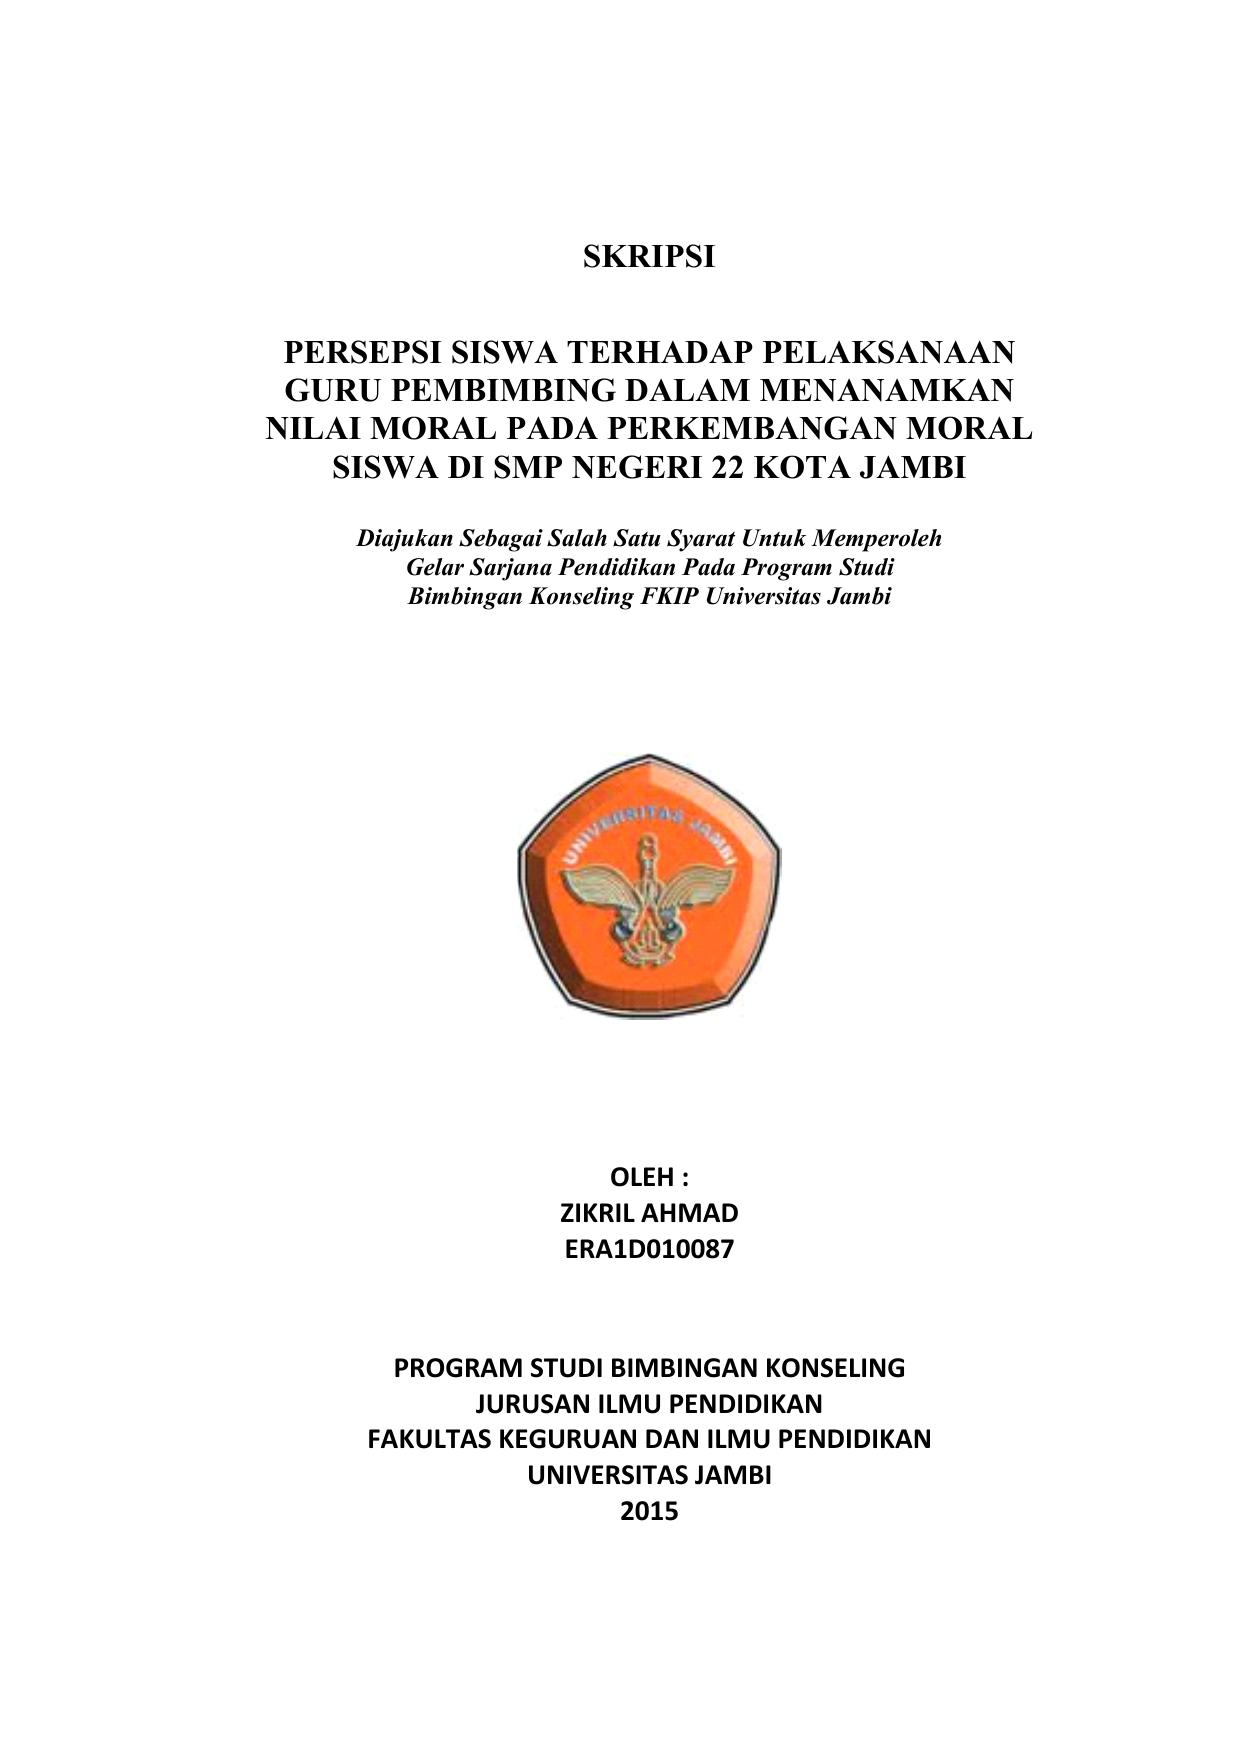 Proposal Skripsi Fkip Universitas Jambi